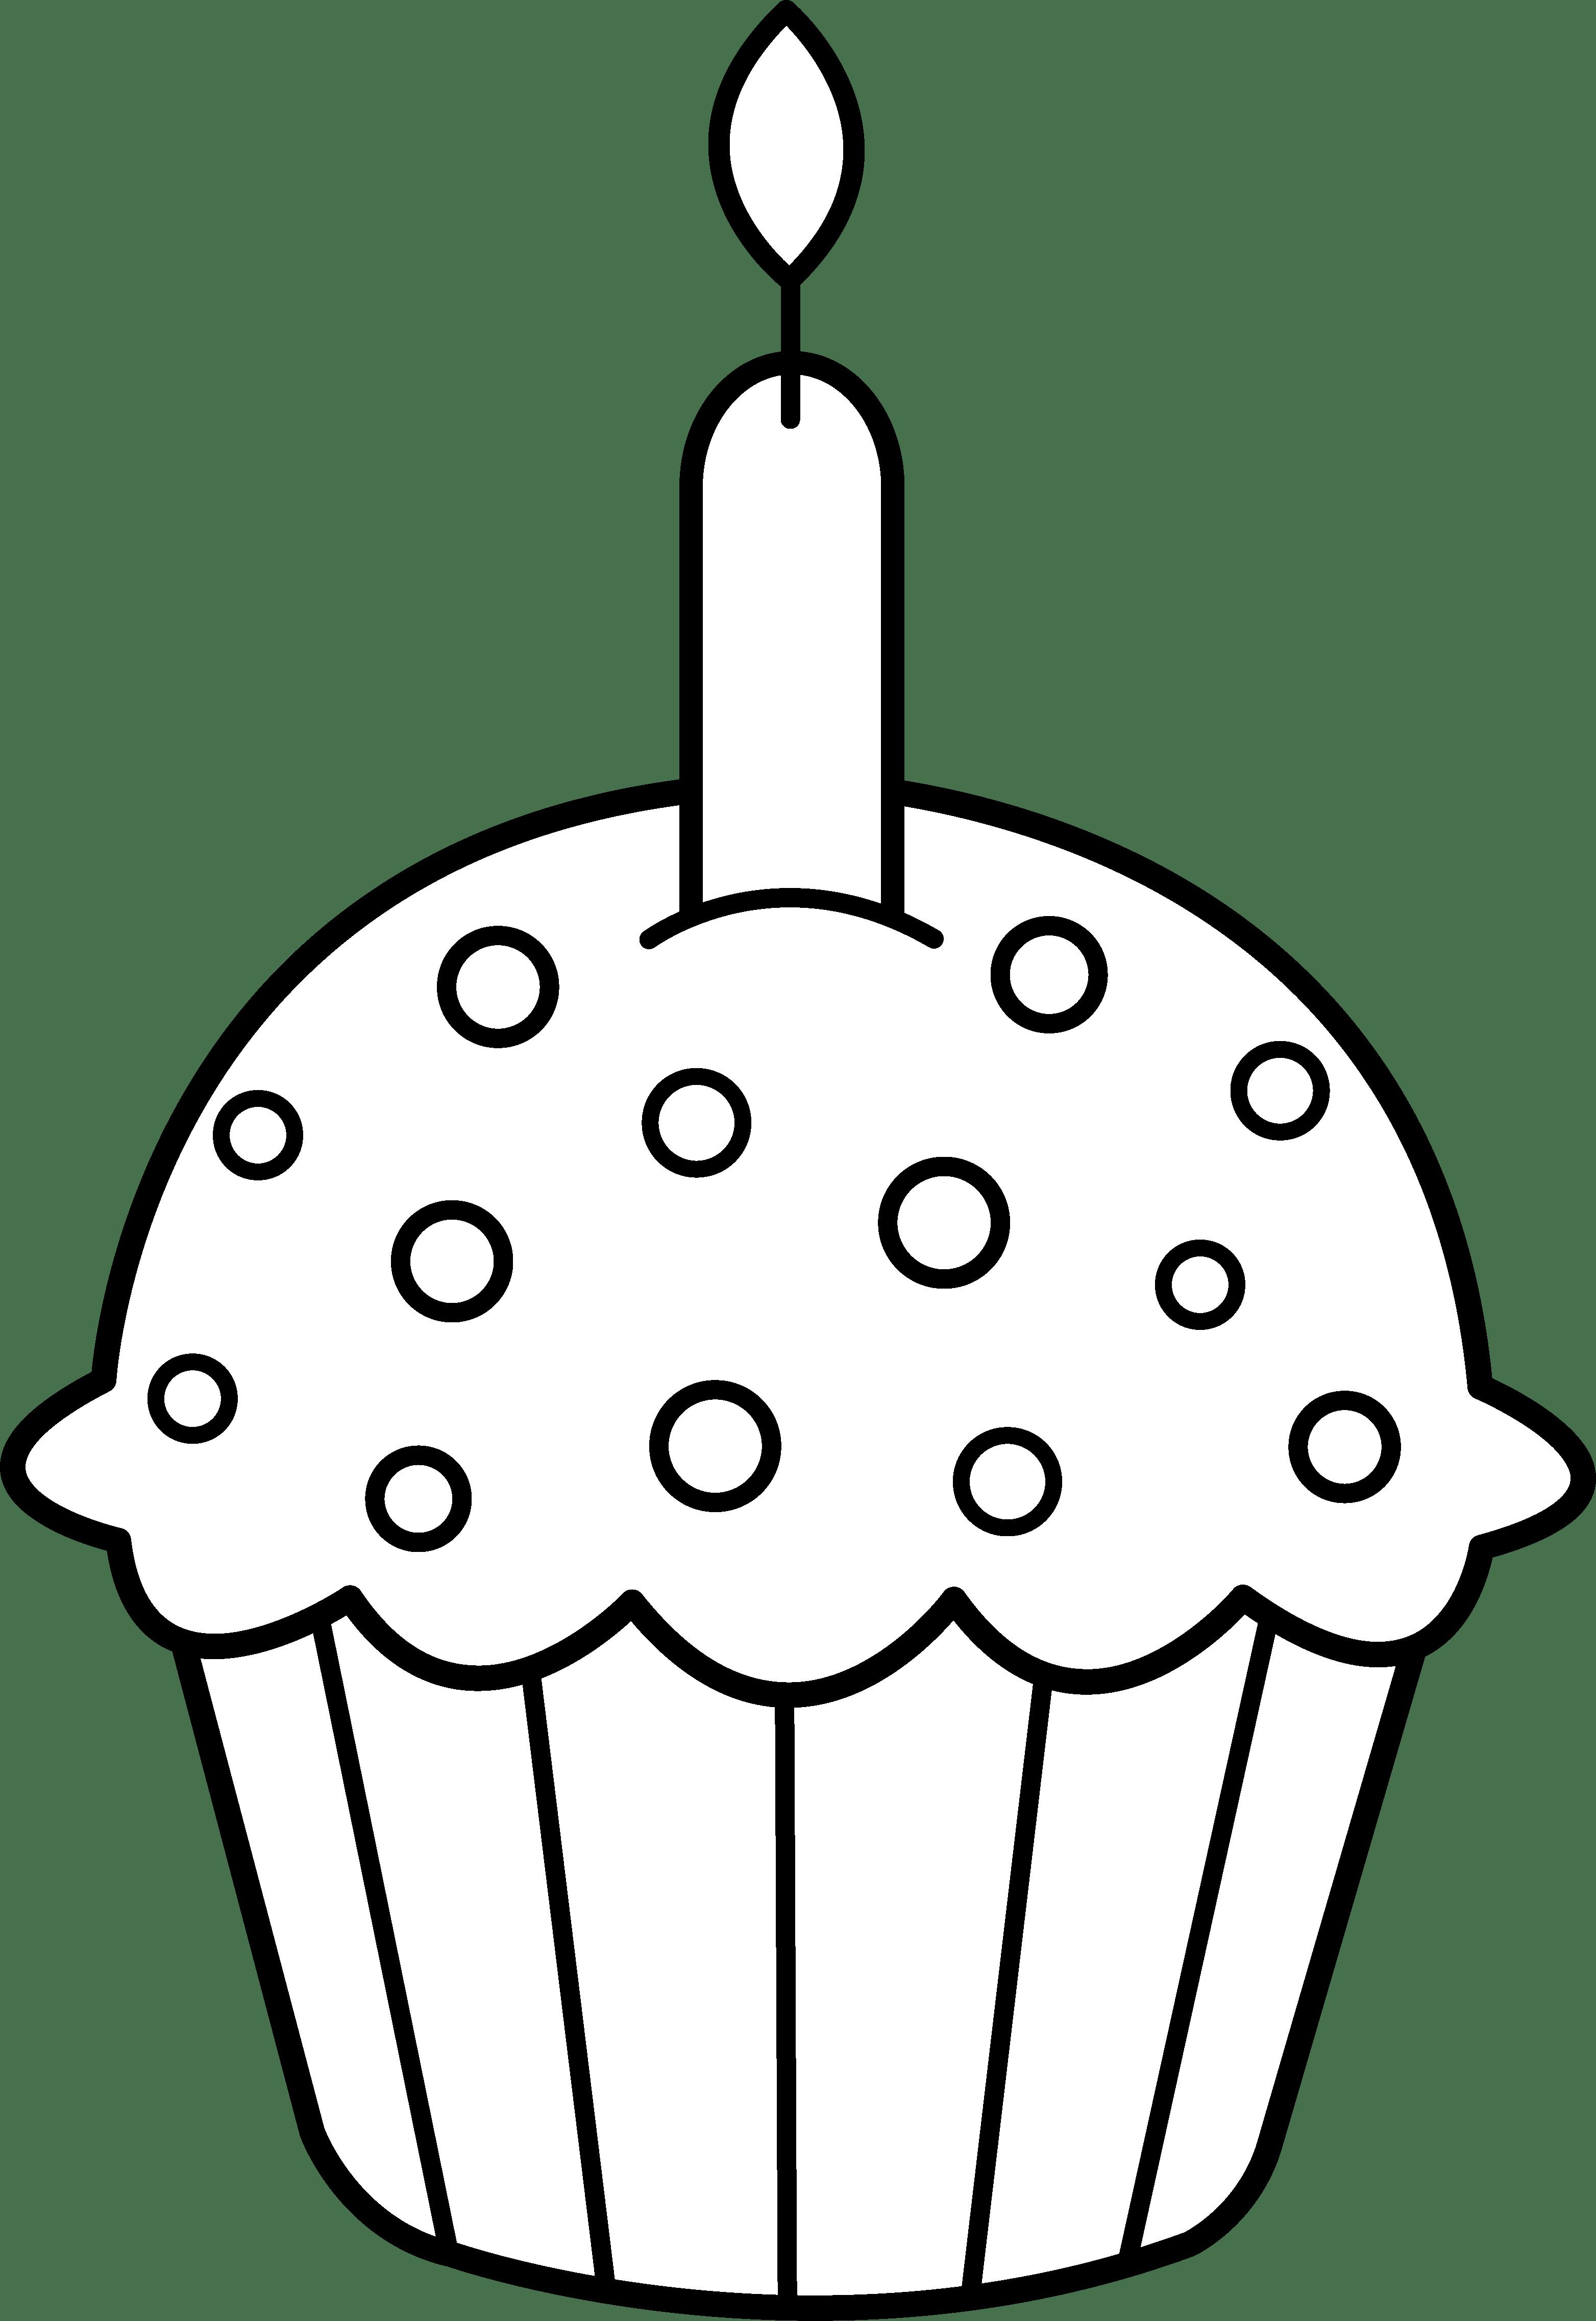 Cupcake Clipart Black And White Clipart Panda